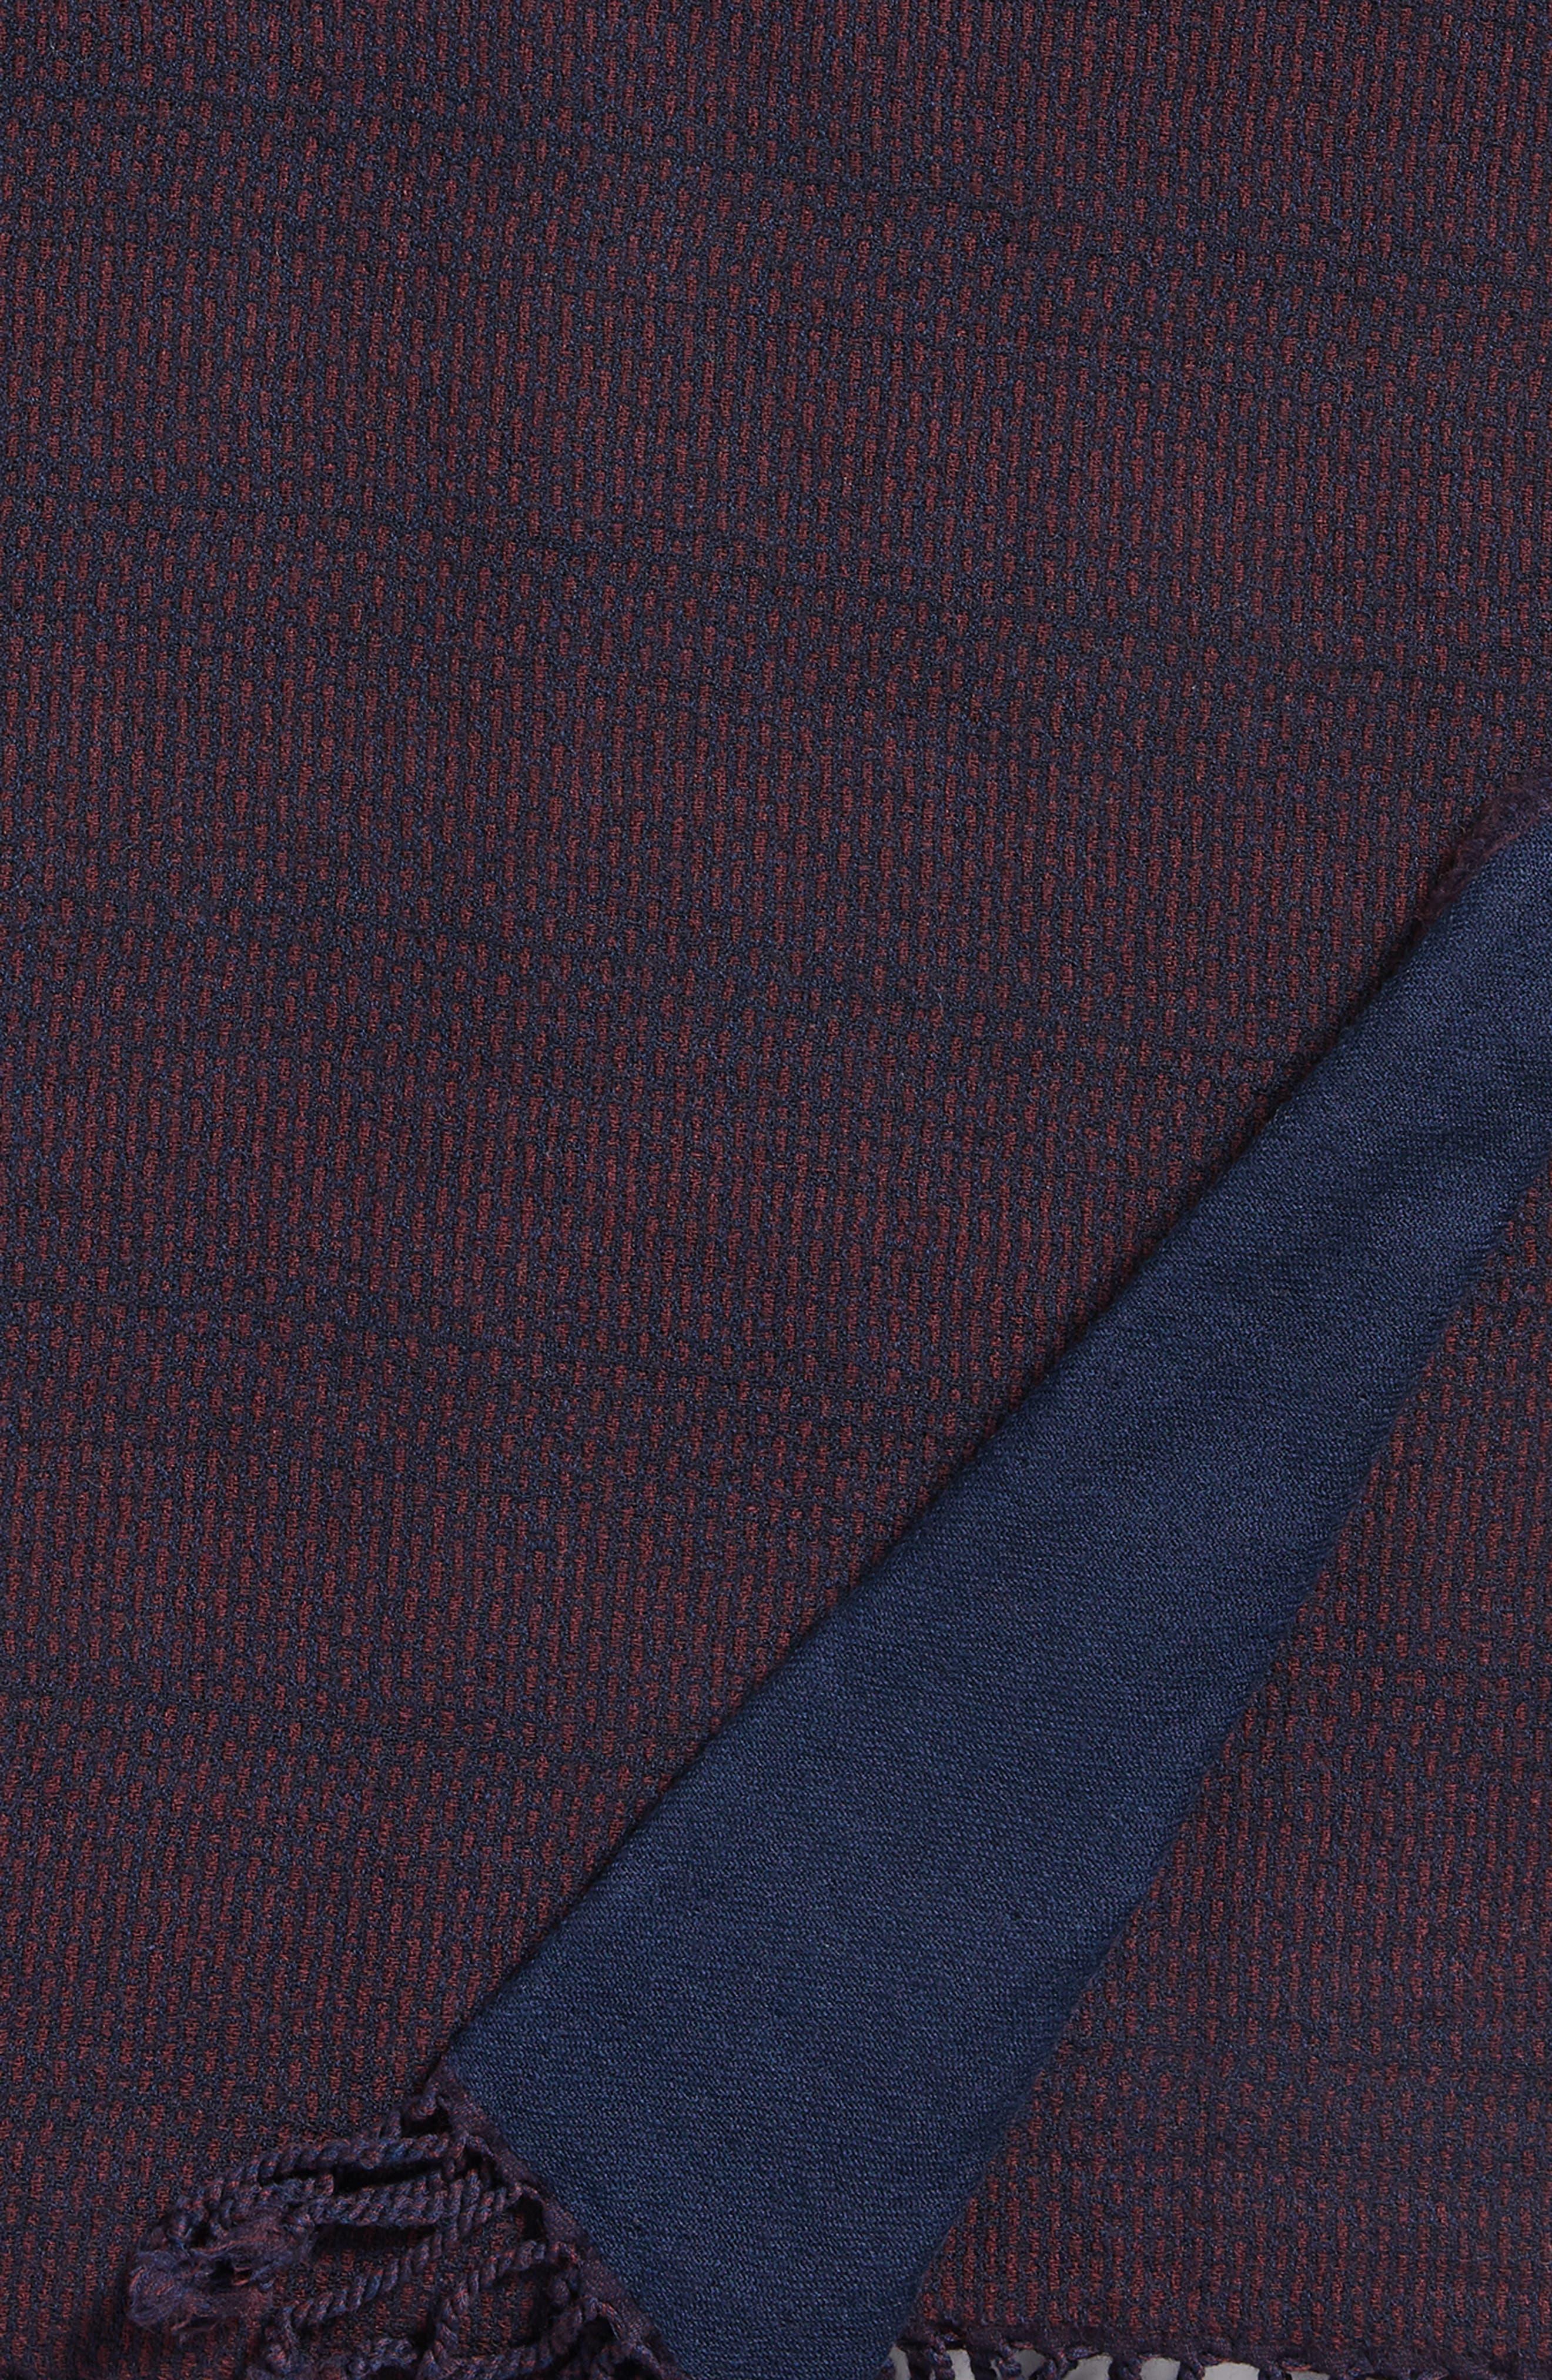 Stipple Stripe Double Face Merino Wool Throw,                             Alternate thumbnail 2, color,                             STIPPLE STRIPE